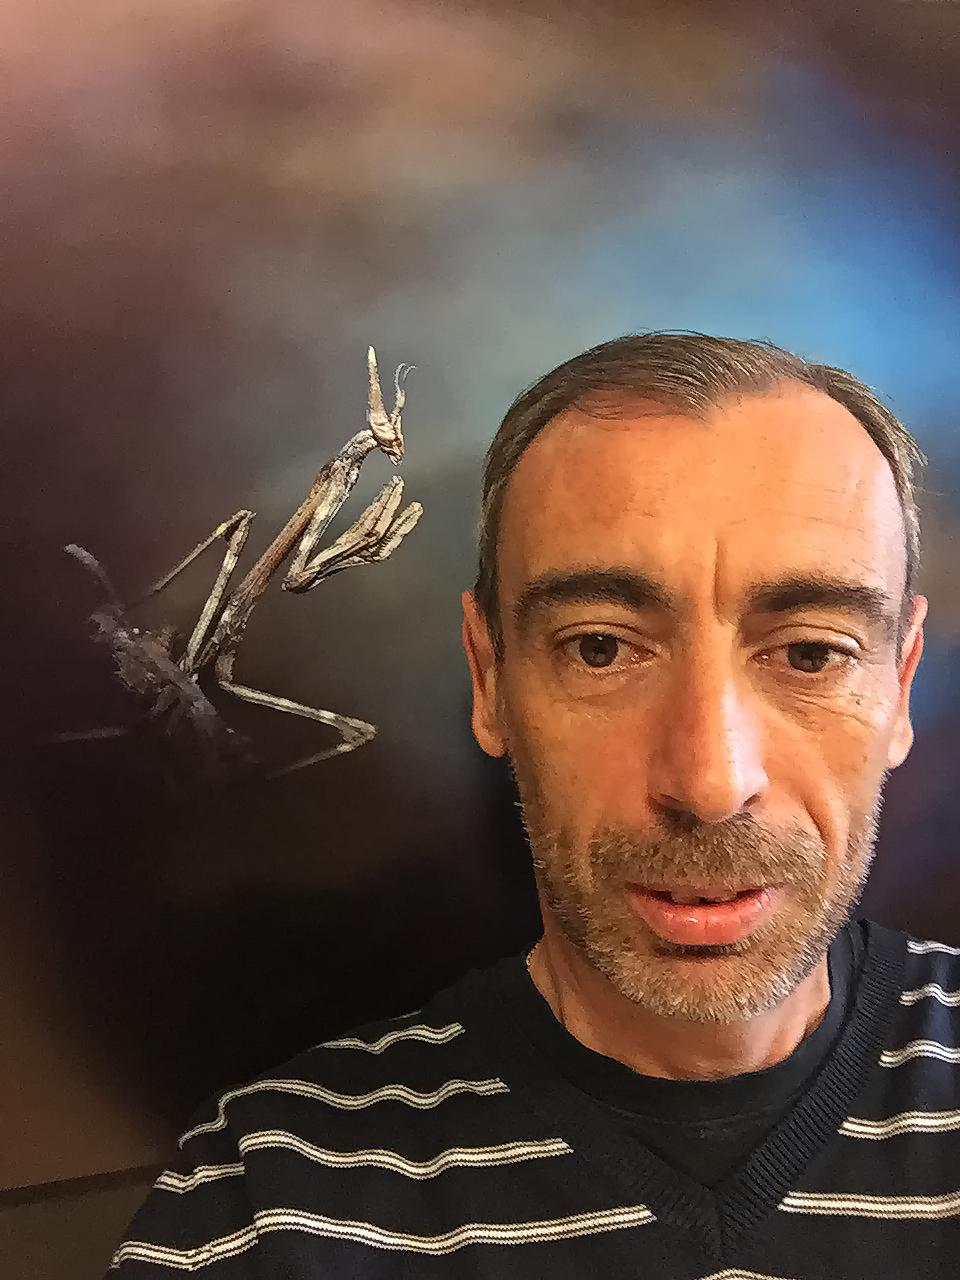 70_autoportraitdg.jpg -